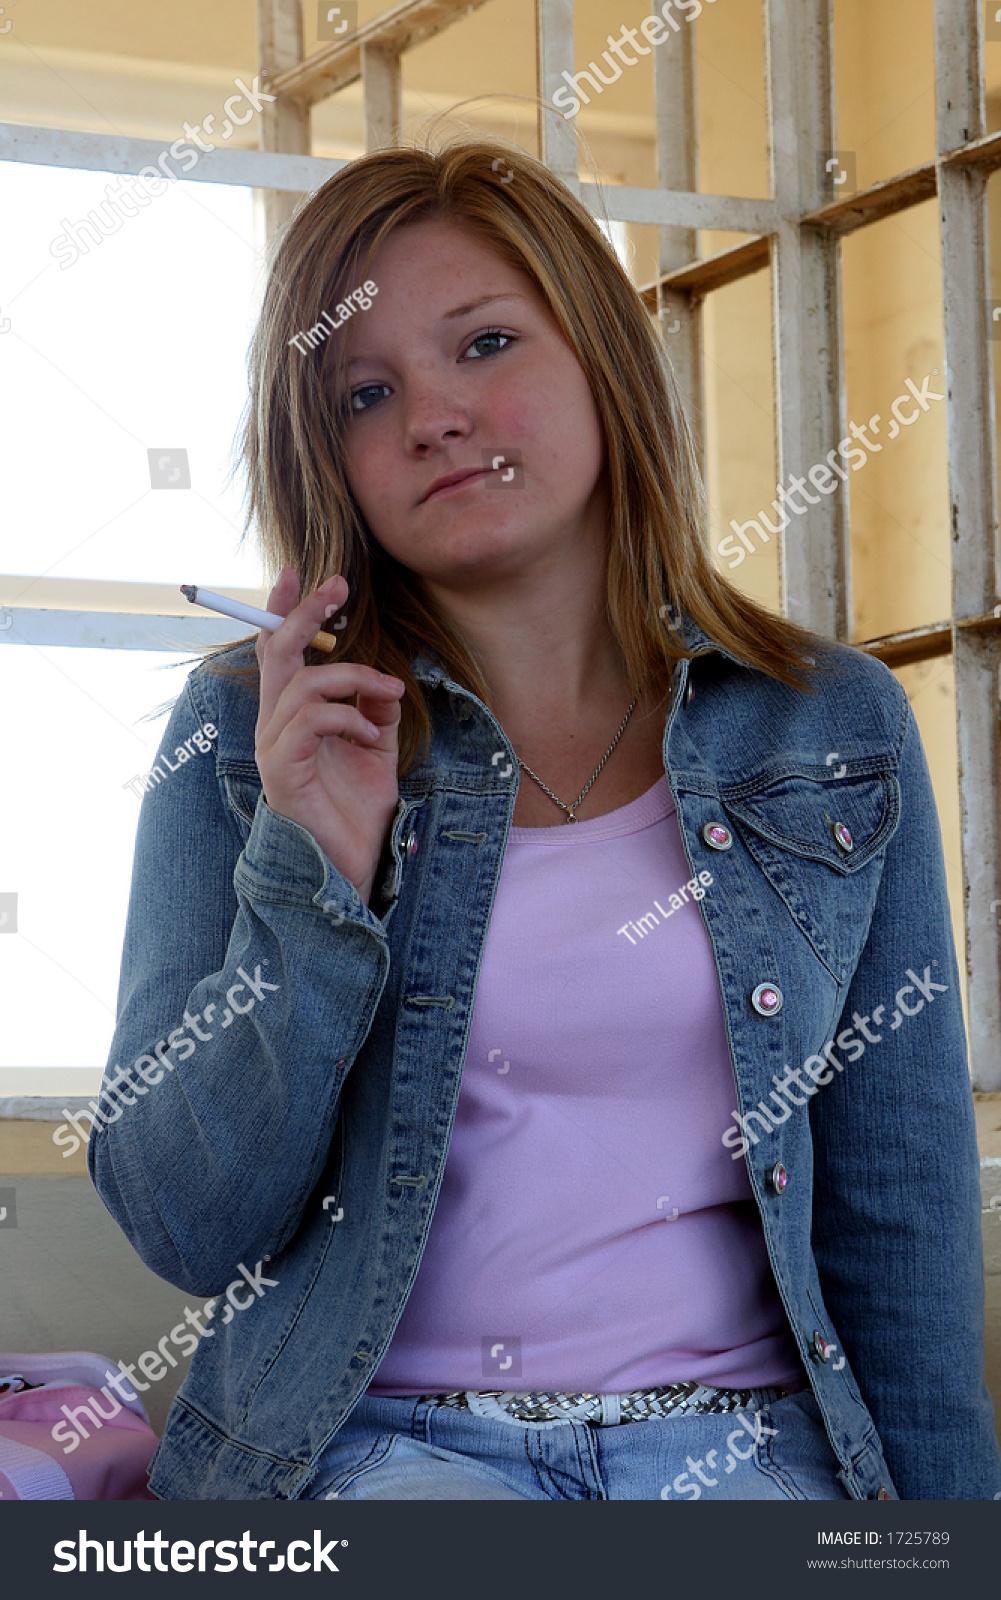 Did Camel Ads Encourage Teen Girls to Smoke? - Health